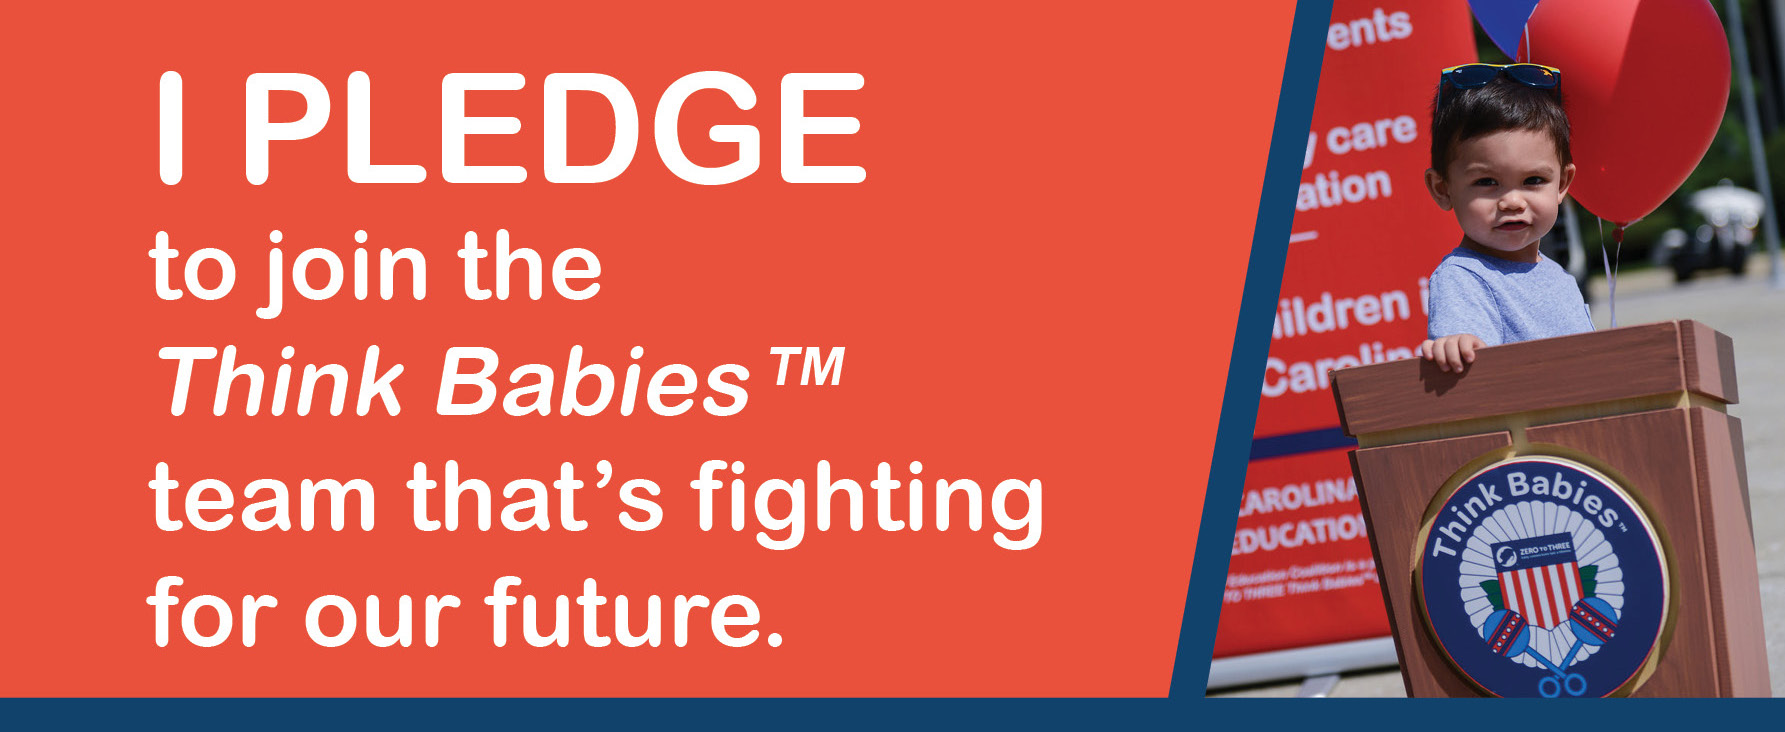 TB Pledge